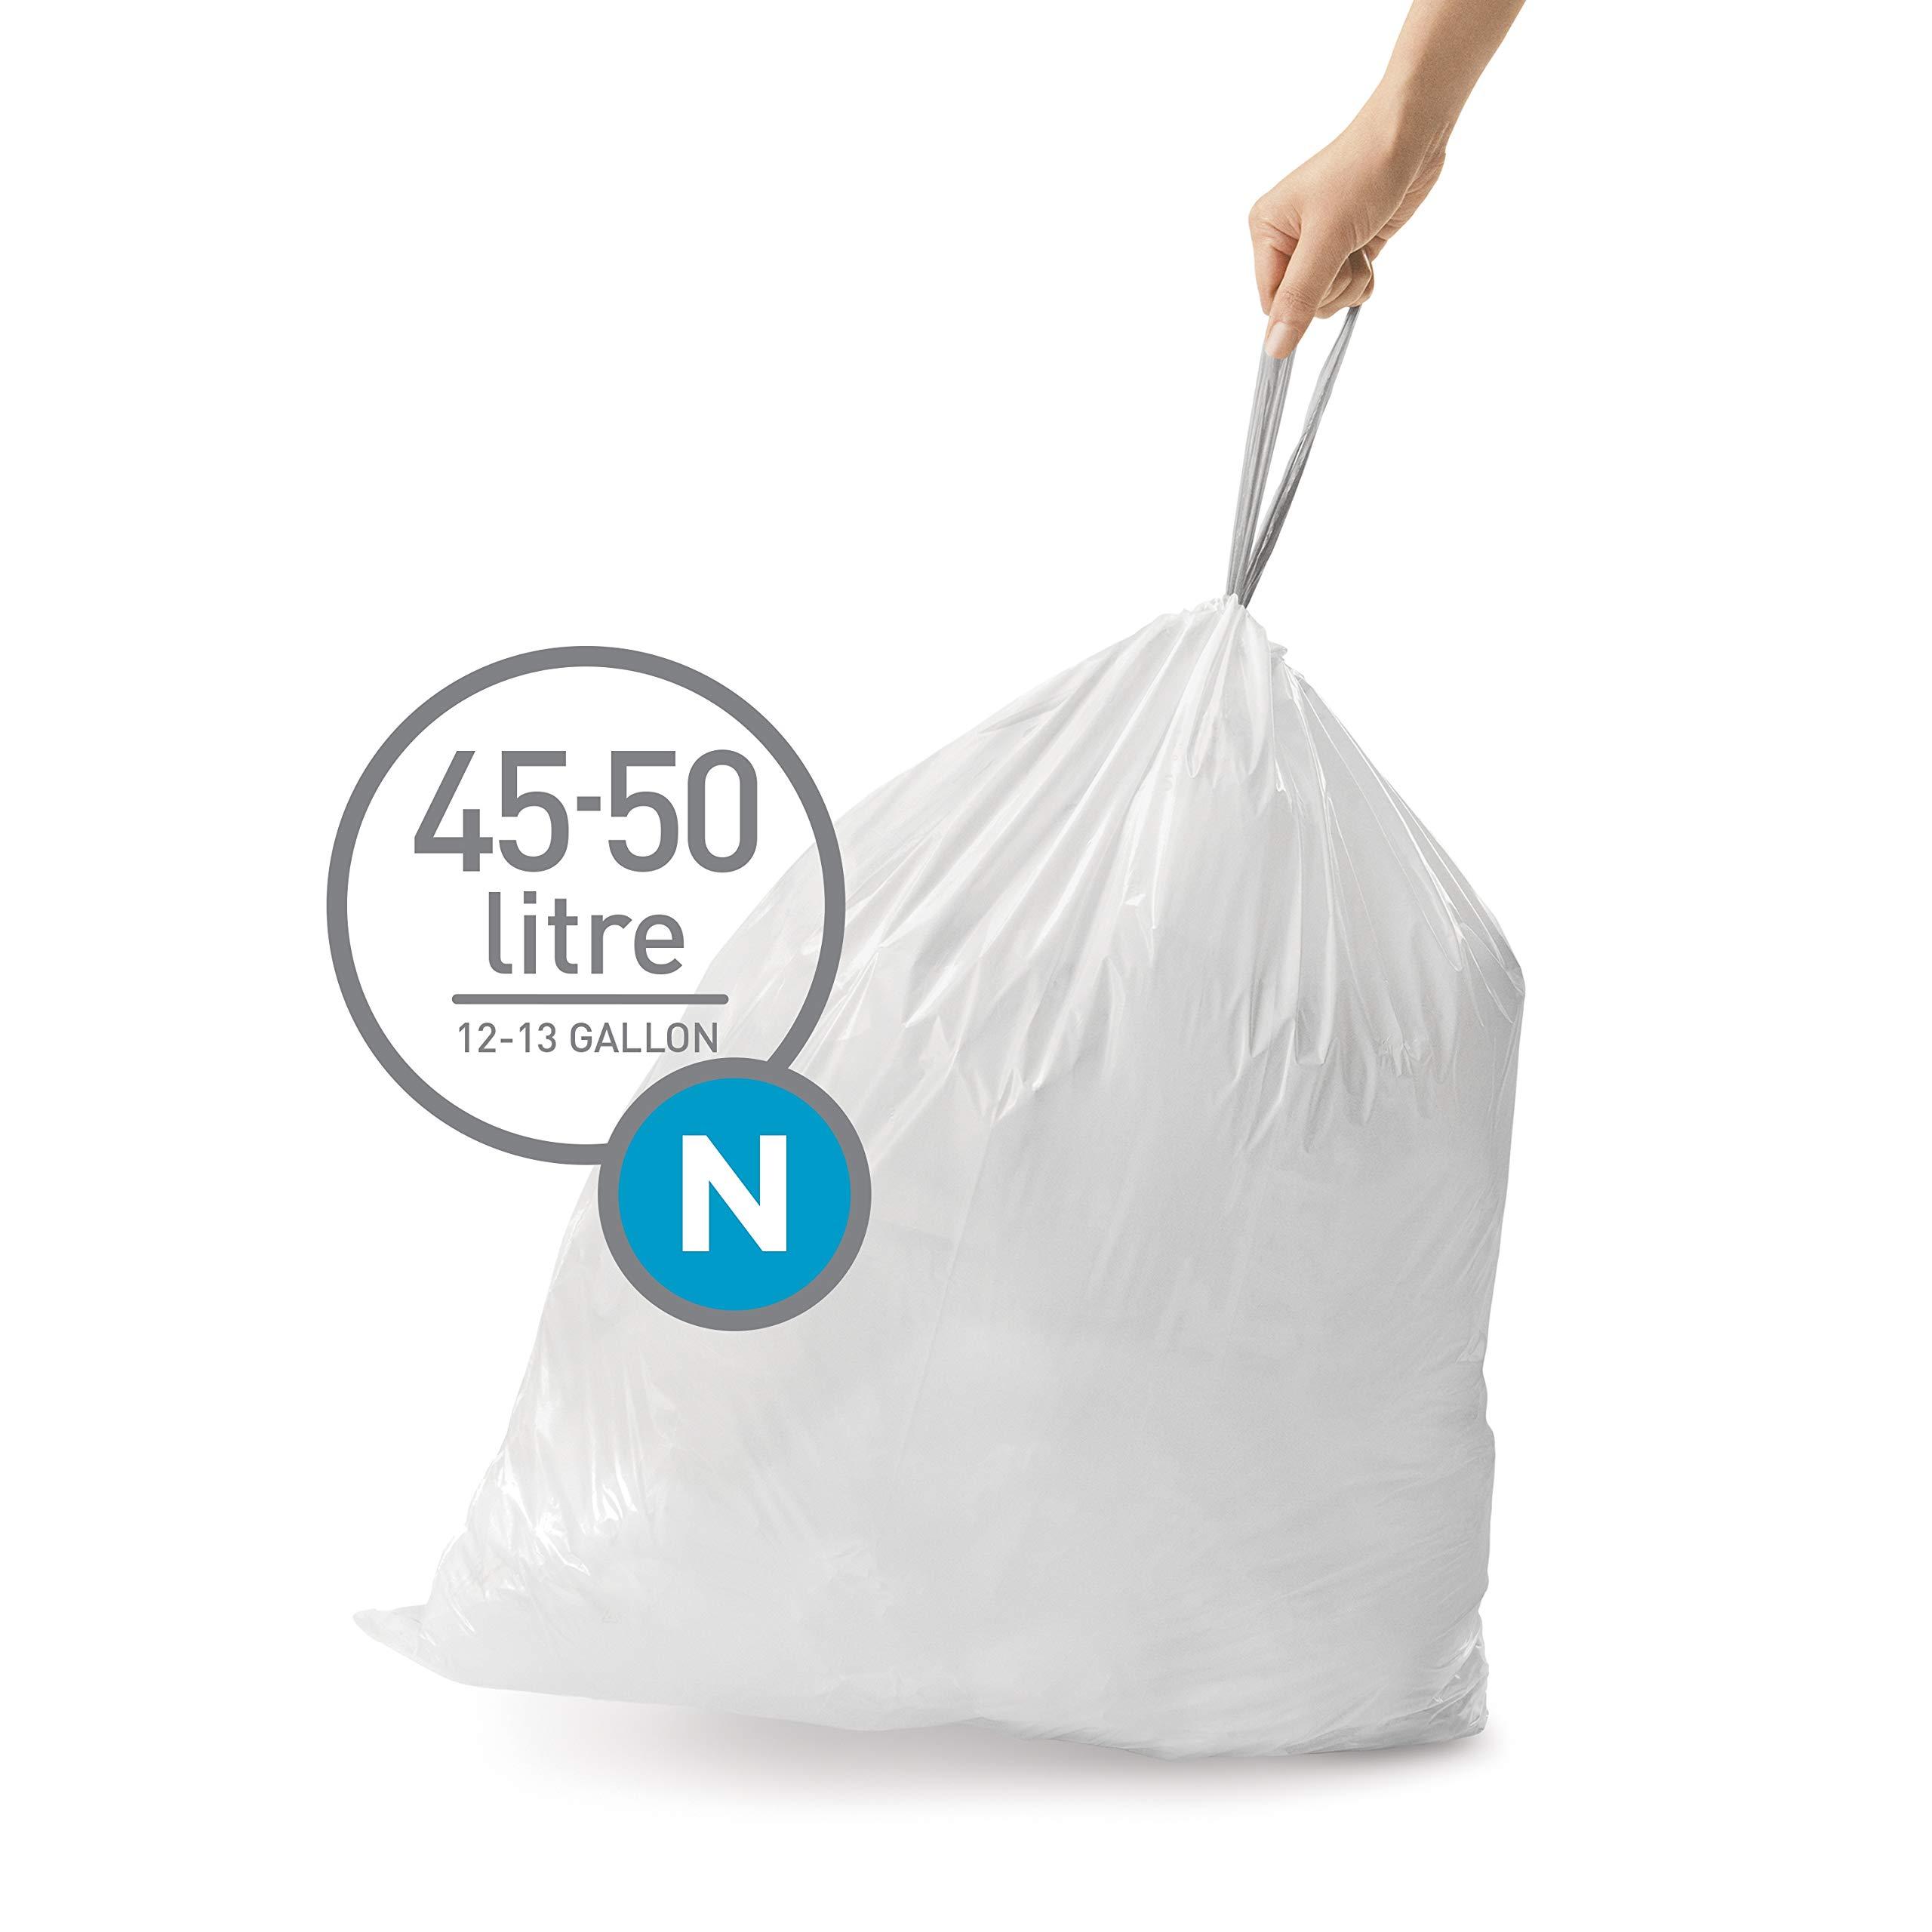 simplehuman Code N Custom Fit Drawstring Trash Bags, 45-50 Liter / 12-13 Gallon (200 Count) by simplehuman